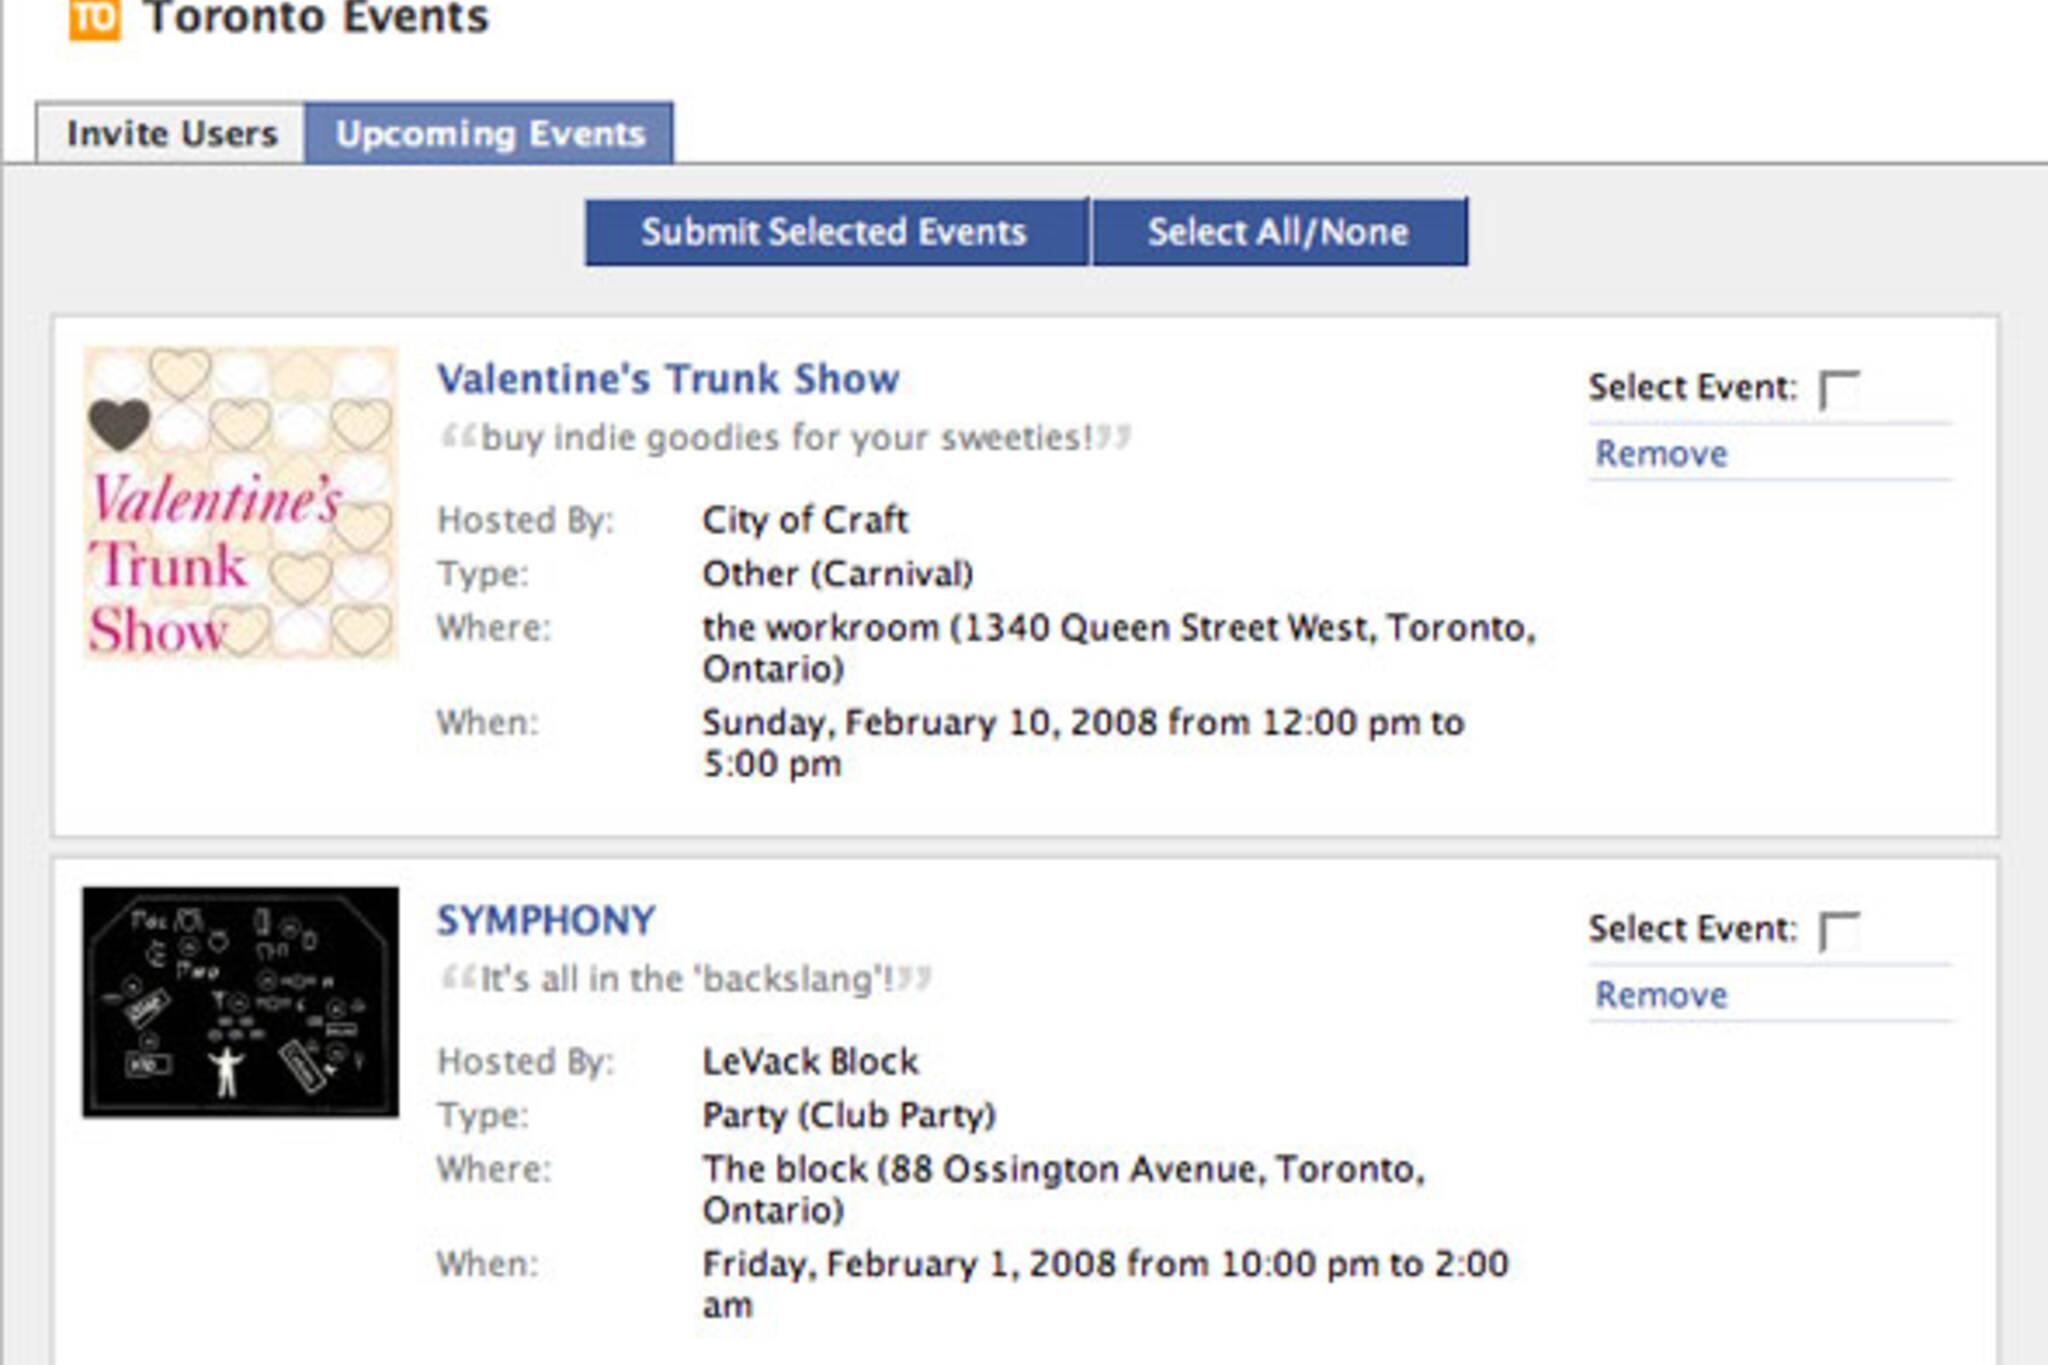 Toronto Events Facebook Application